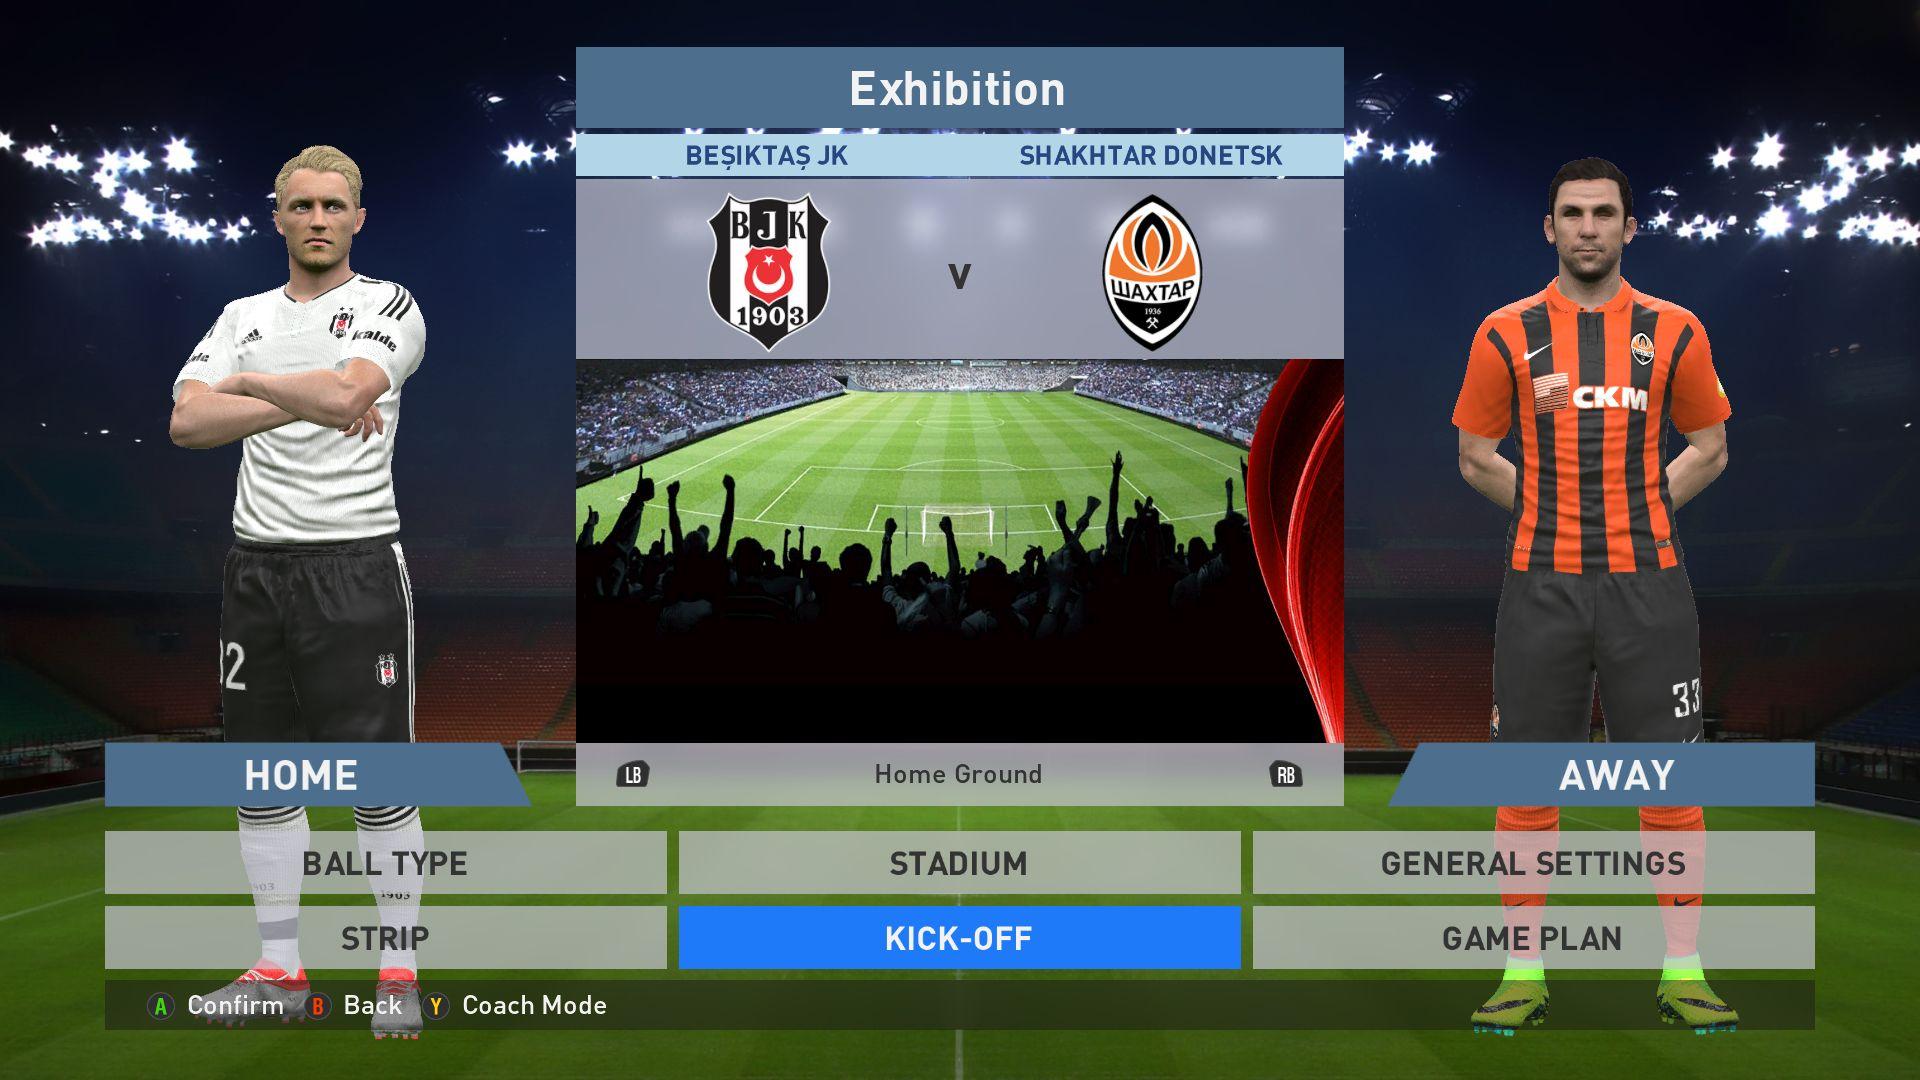 Besiktas Jk Vs Shakhtar Donetsk Bjk Vodafone Park Pes 2016 Pro Evolution Soccer 2016 Konami Pc Gameplay Pro Evolution Soccer Donetsk Soccer